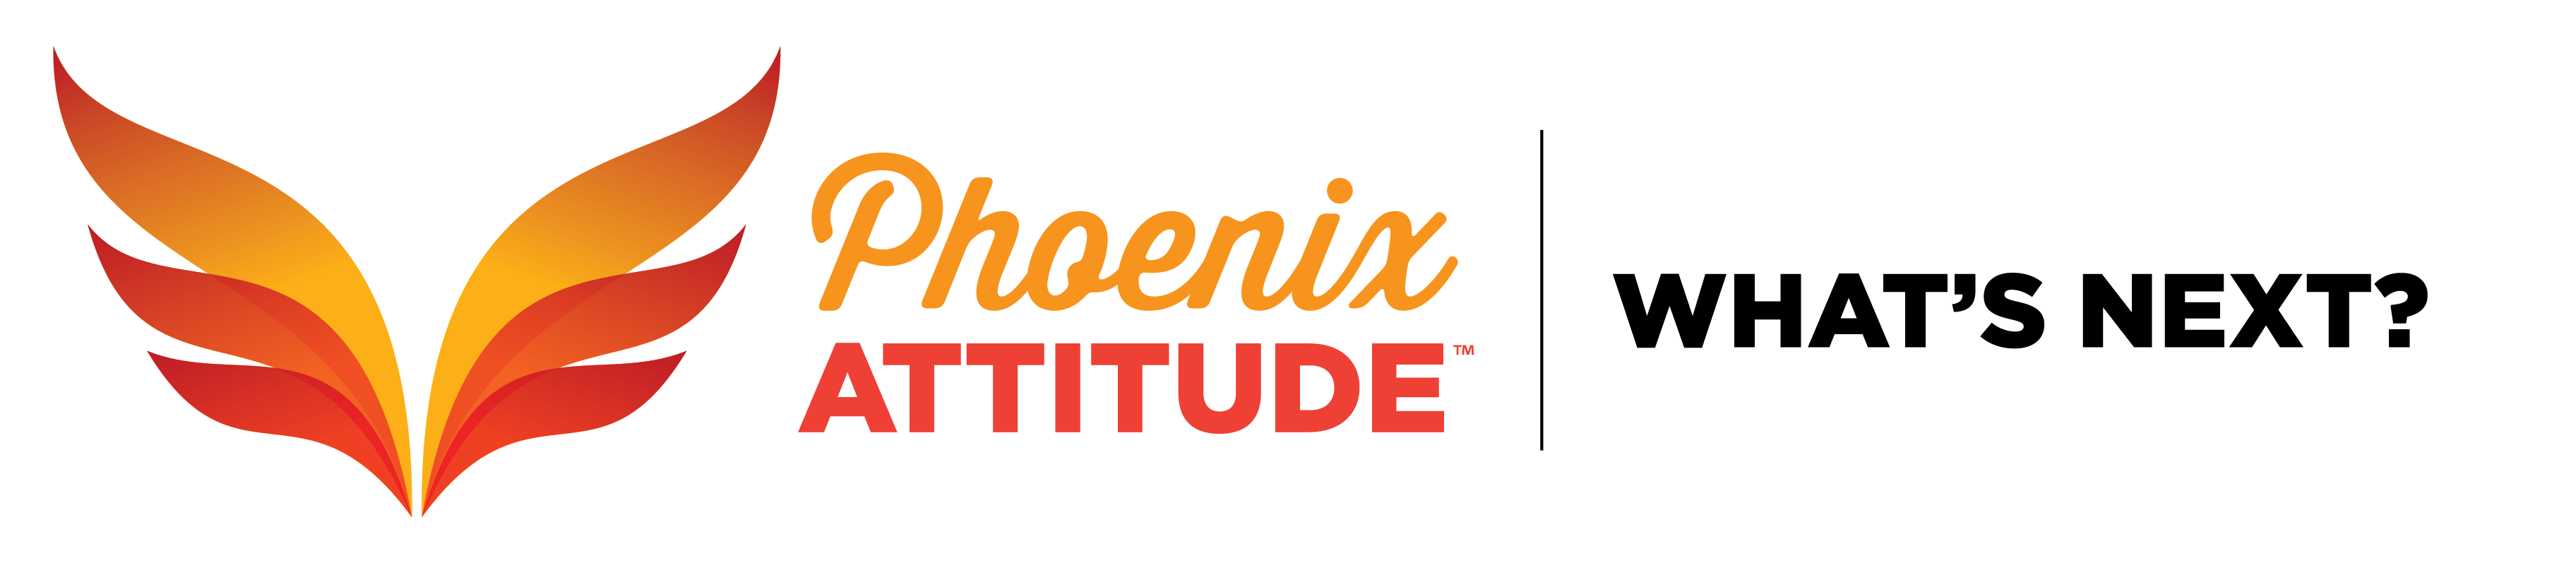 Phoenix Attitude logo, tagline, What's Next?